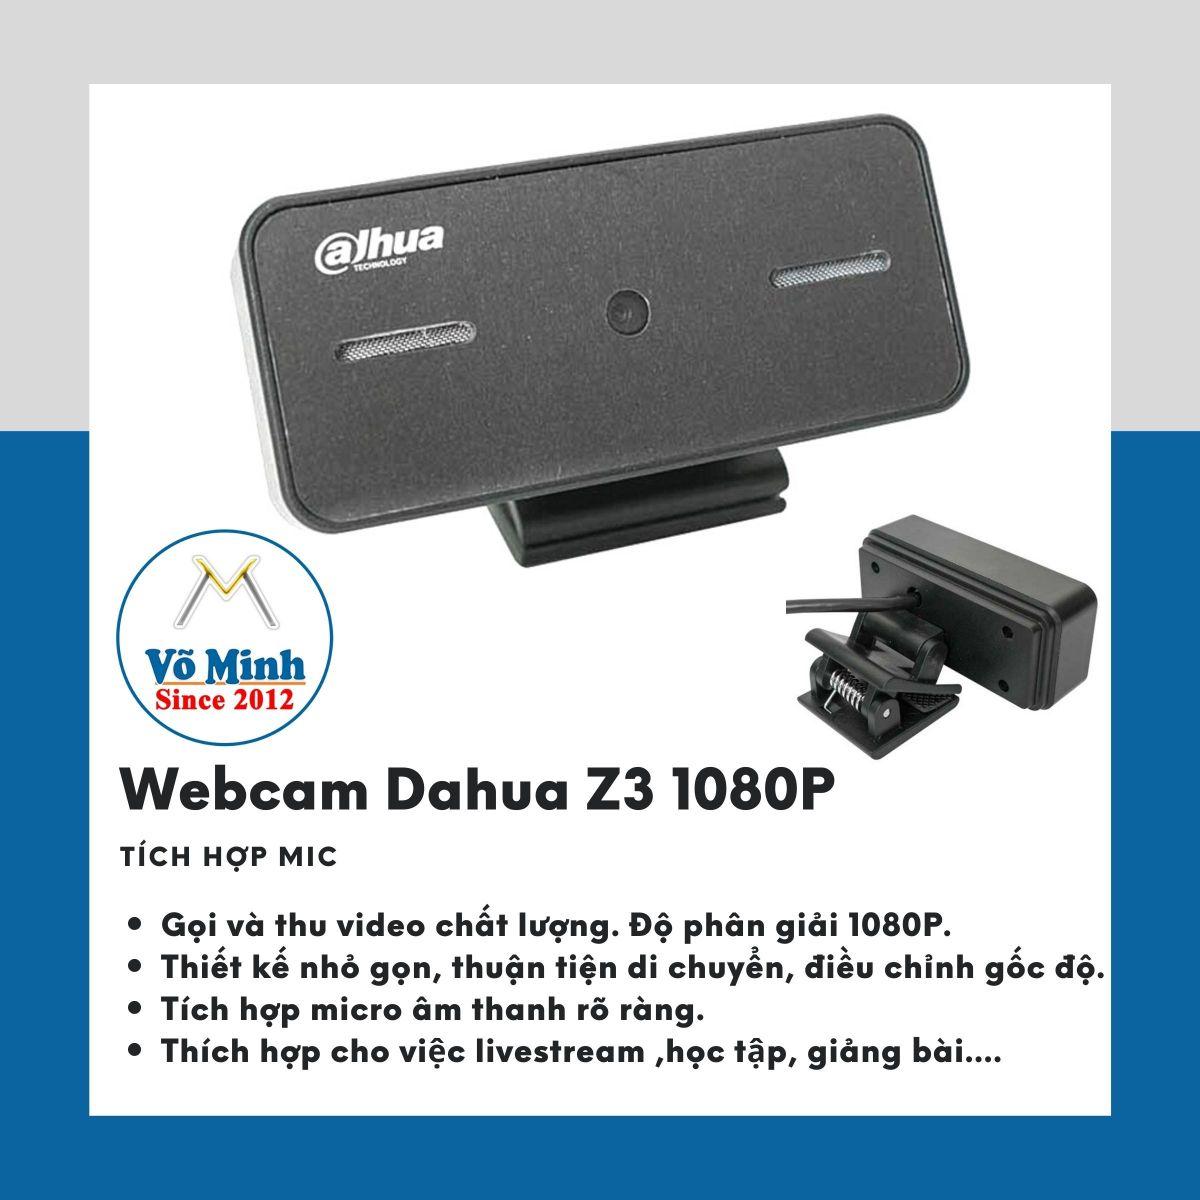 San-Pham-Webcam-Dahua-Z3-Tich-Hop-Mic-Chat-Luong-Anh-1080p